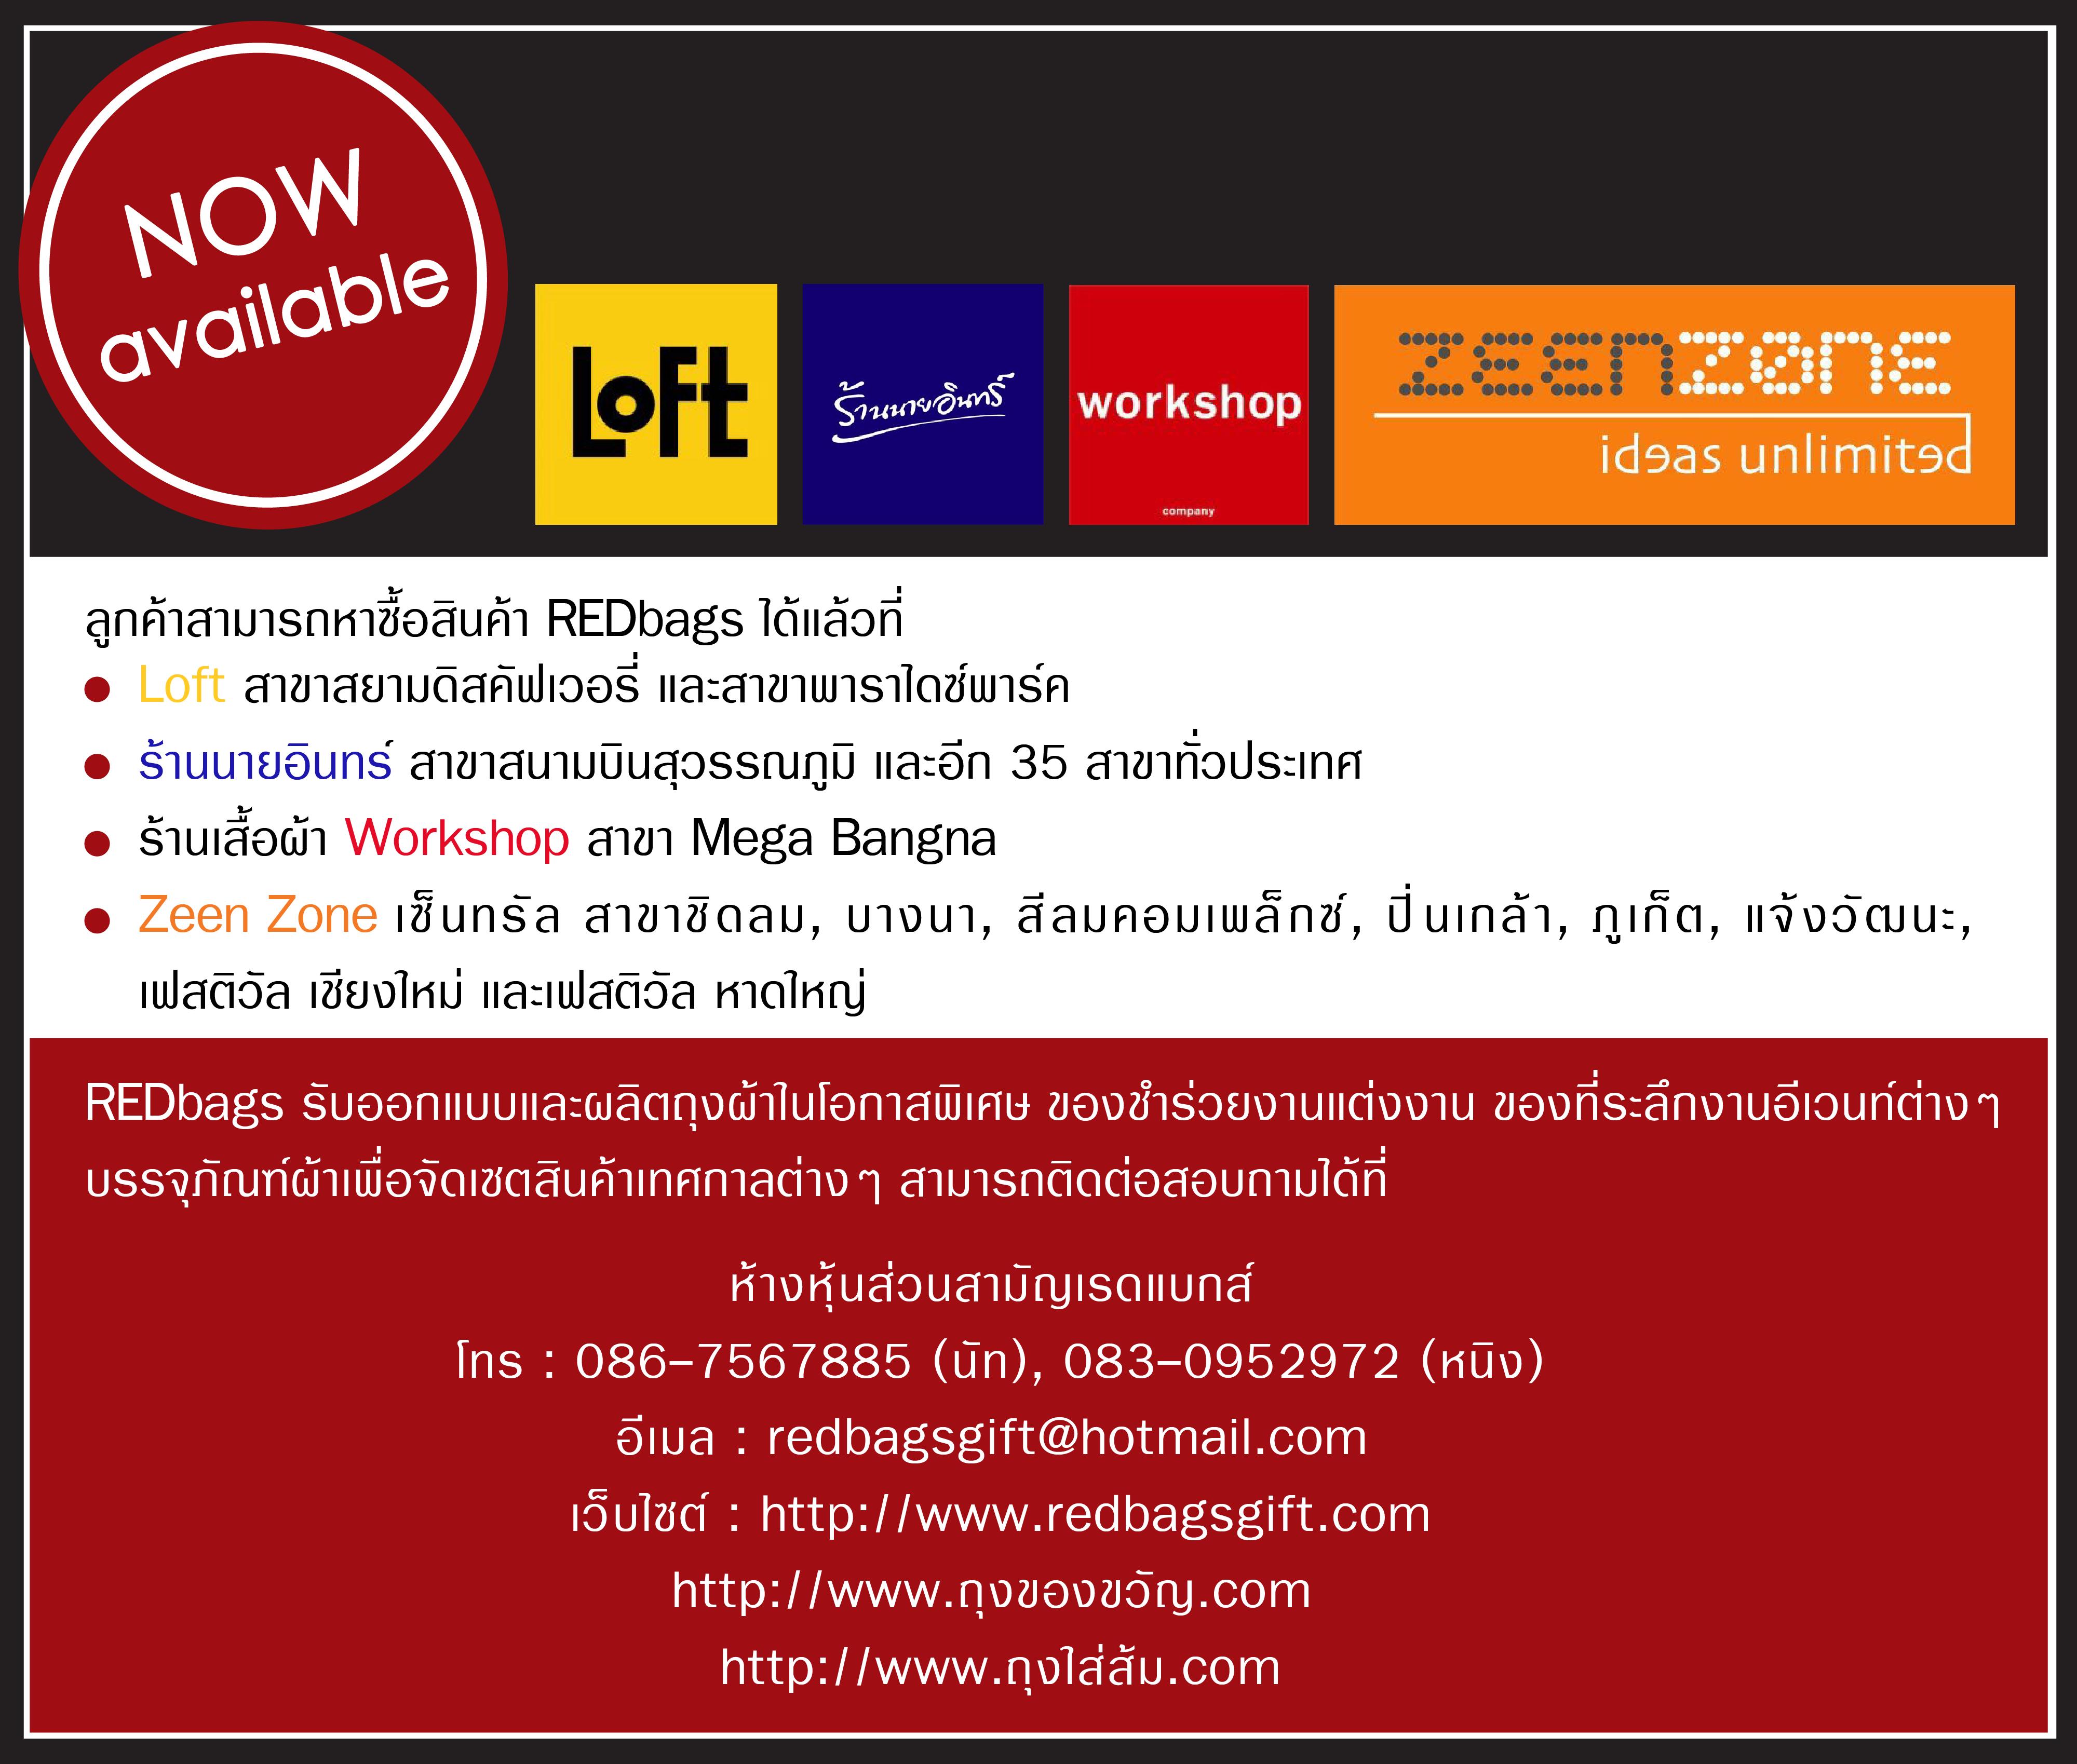 REDbags Loft ร้านนายอินทร์ Zeen Zone Workshop